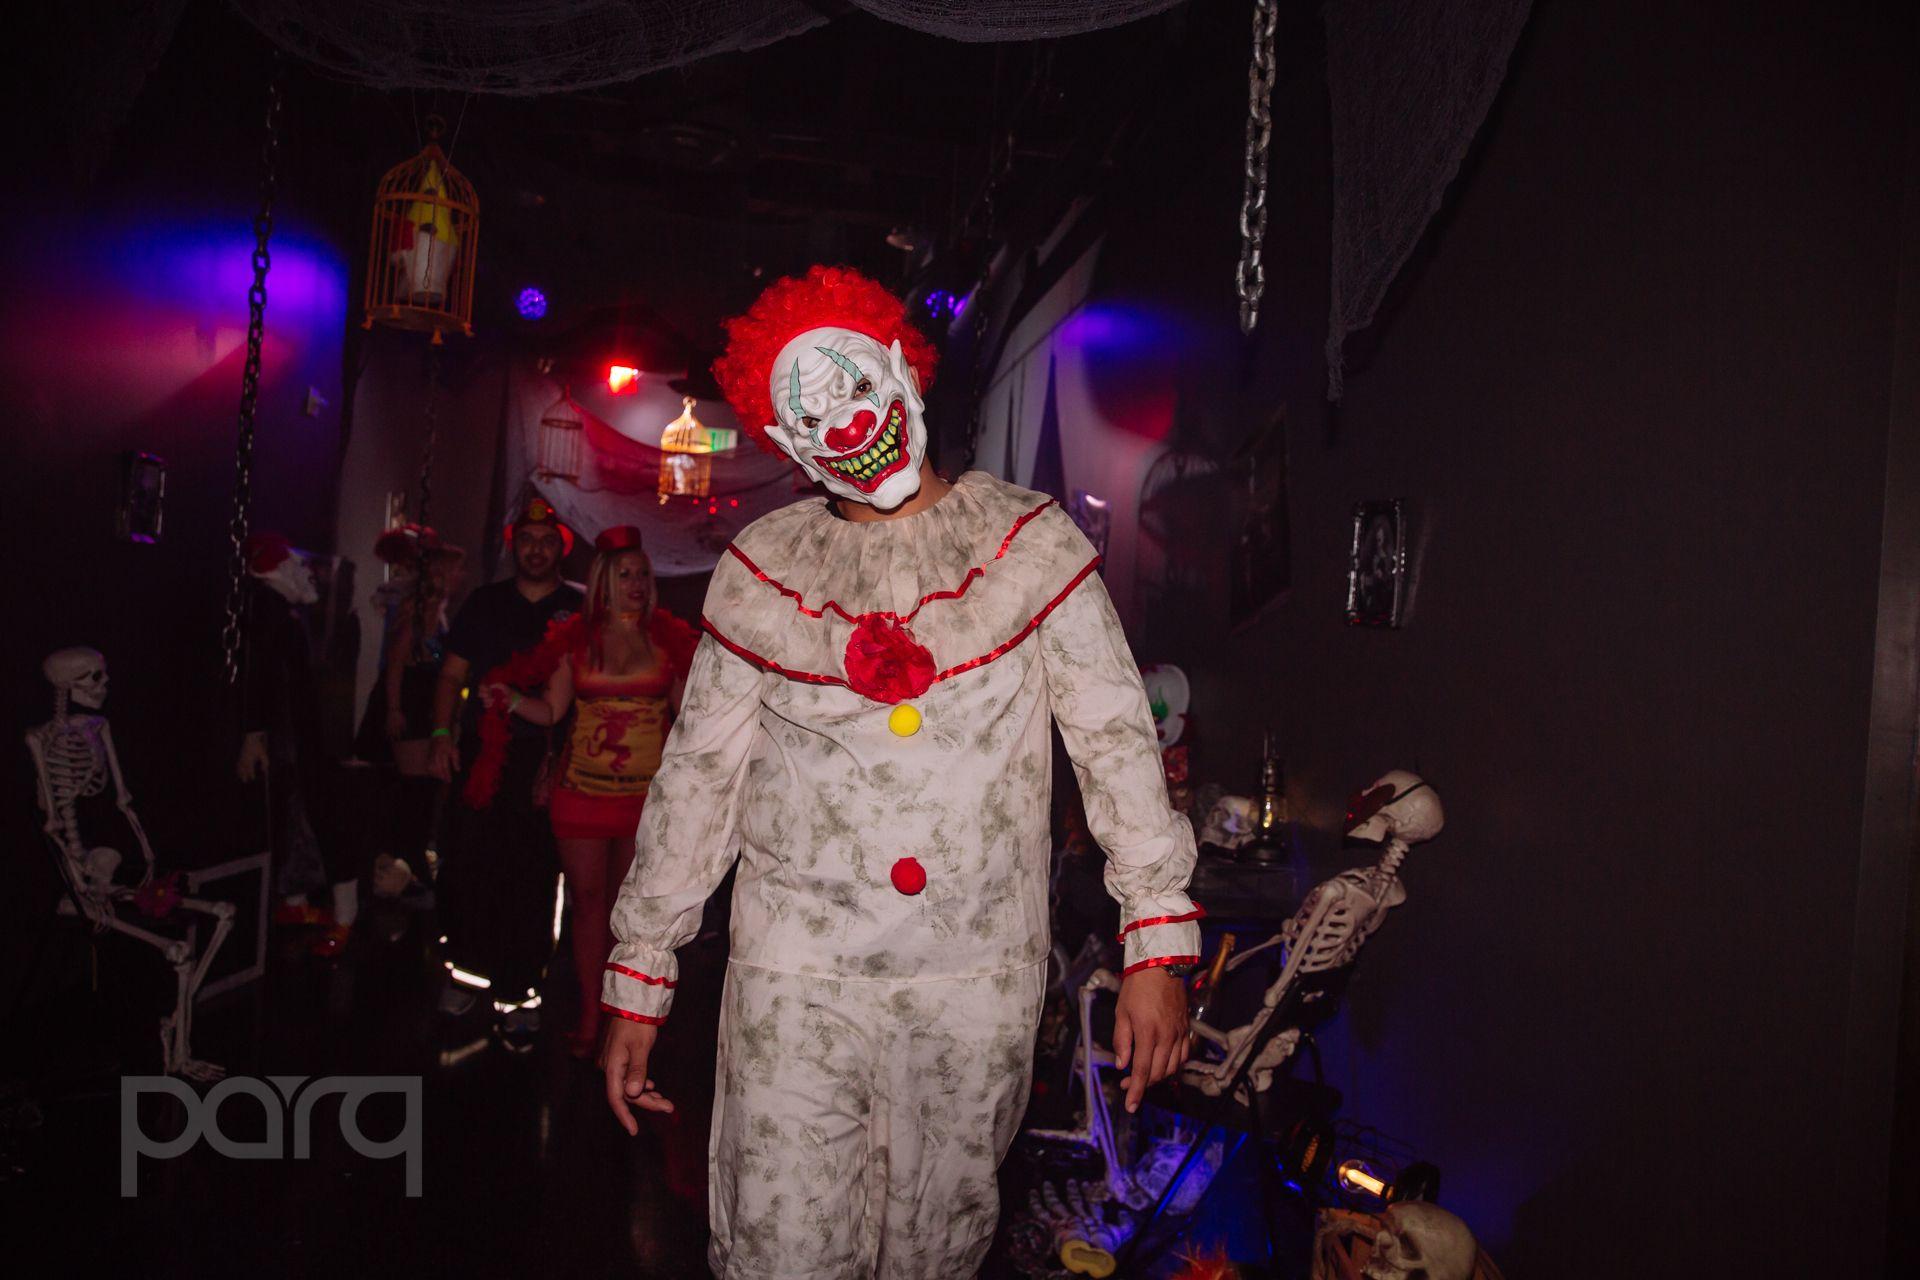 10.28.17 Parq - Haunted Circus-35.jpg